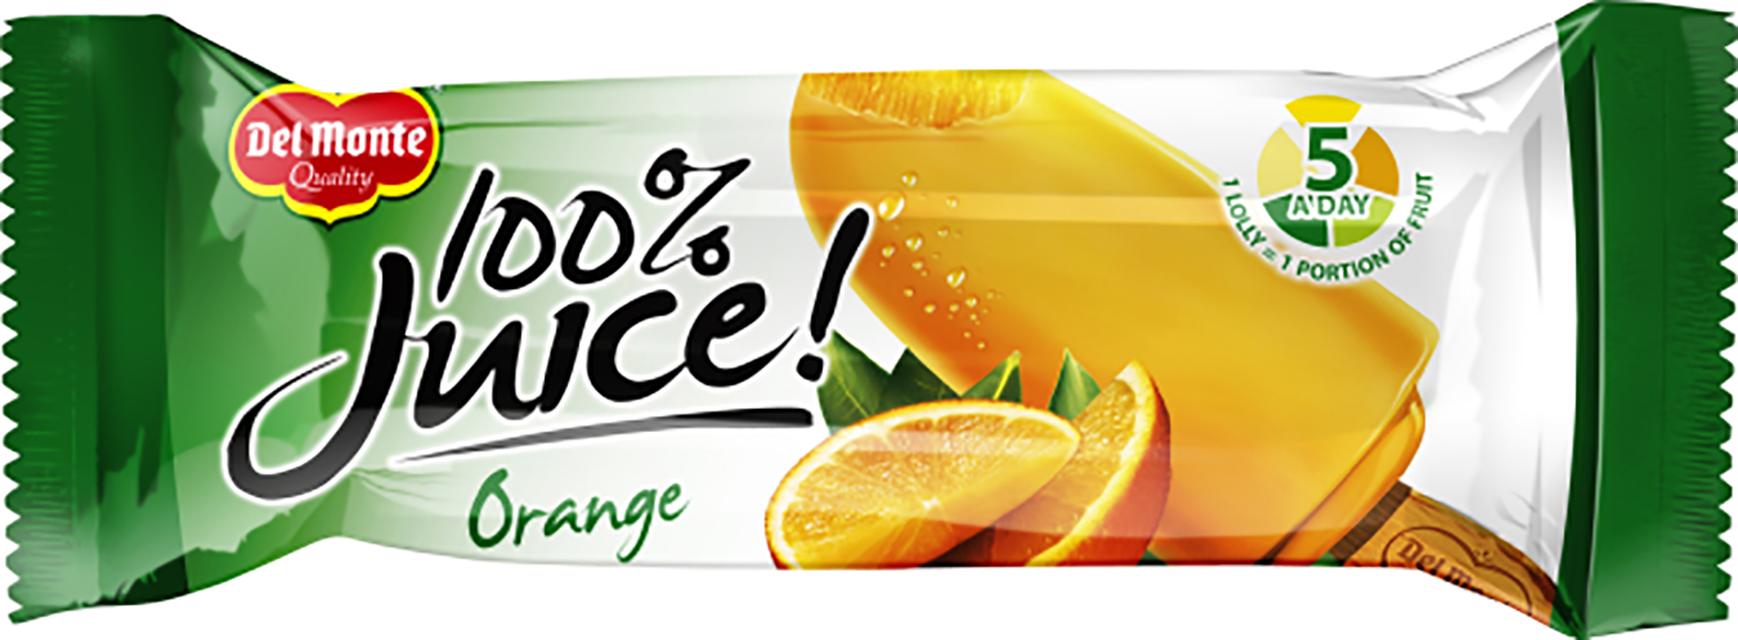 2436 - Del Monte 100%% Juice Orange Wrapped.png